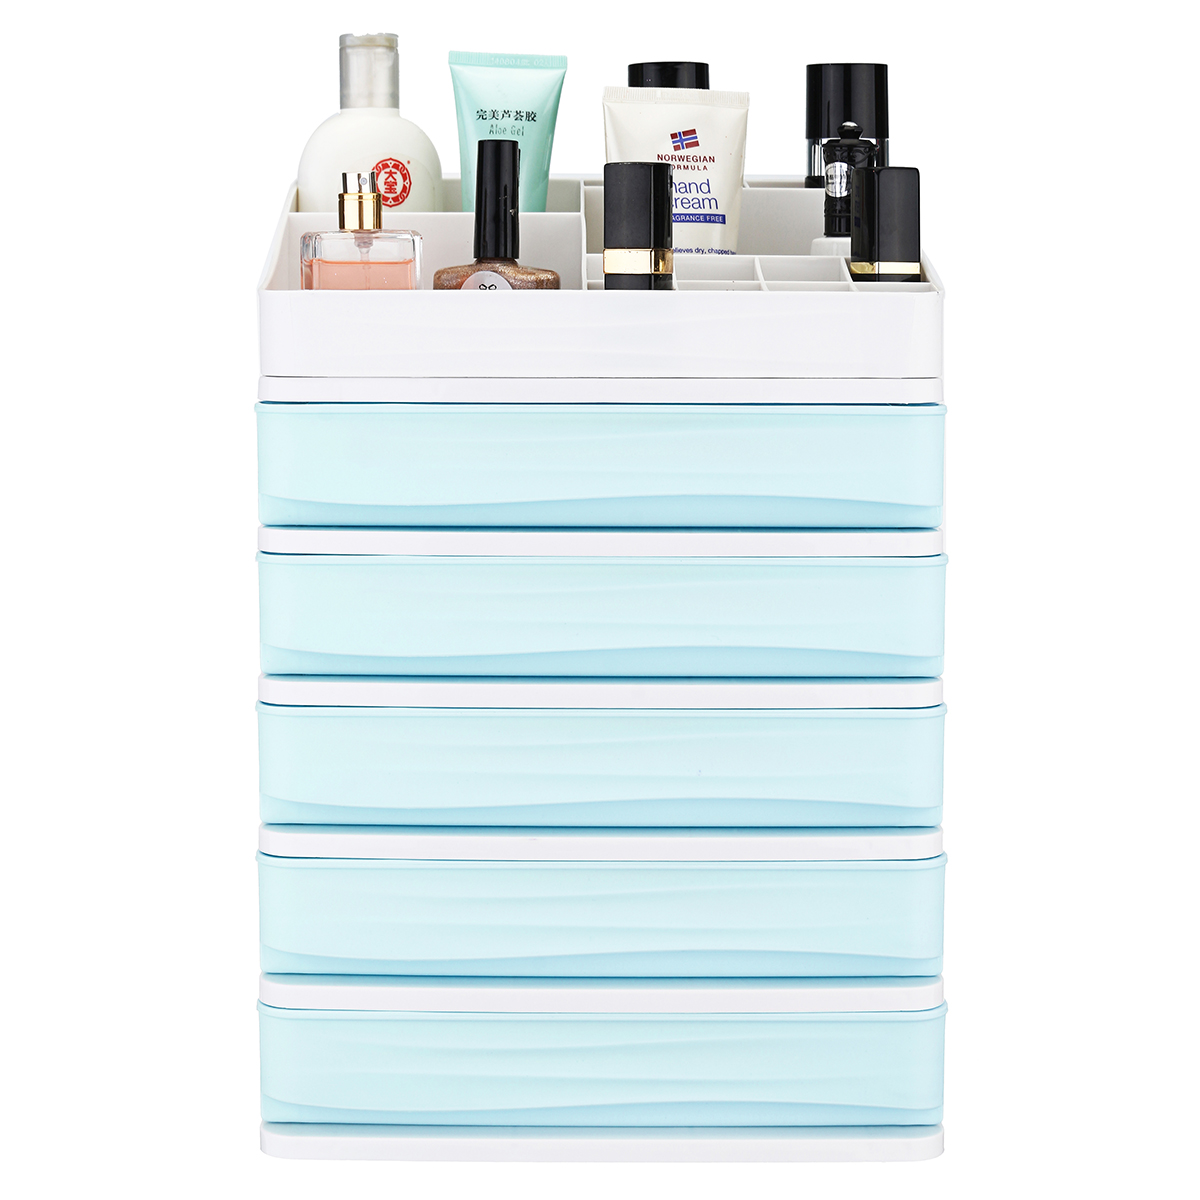 2/3/4/5 Tier Layer Plastic Desktop Organizer Baskets Drawer Jewelry Makeup Case Saving Space Simple Table Storage Box